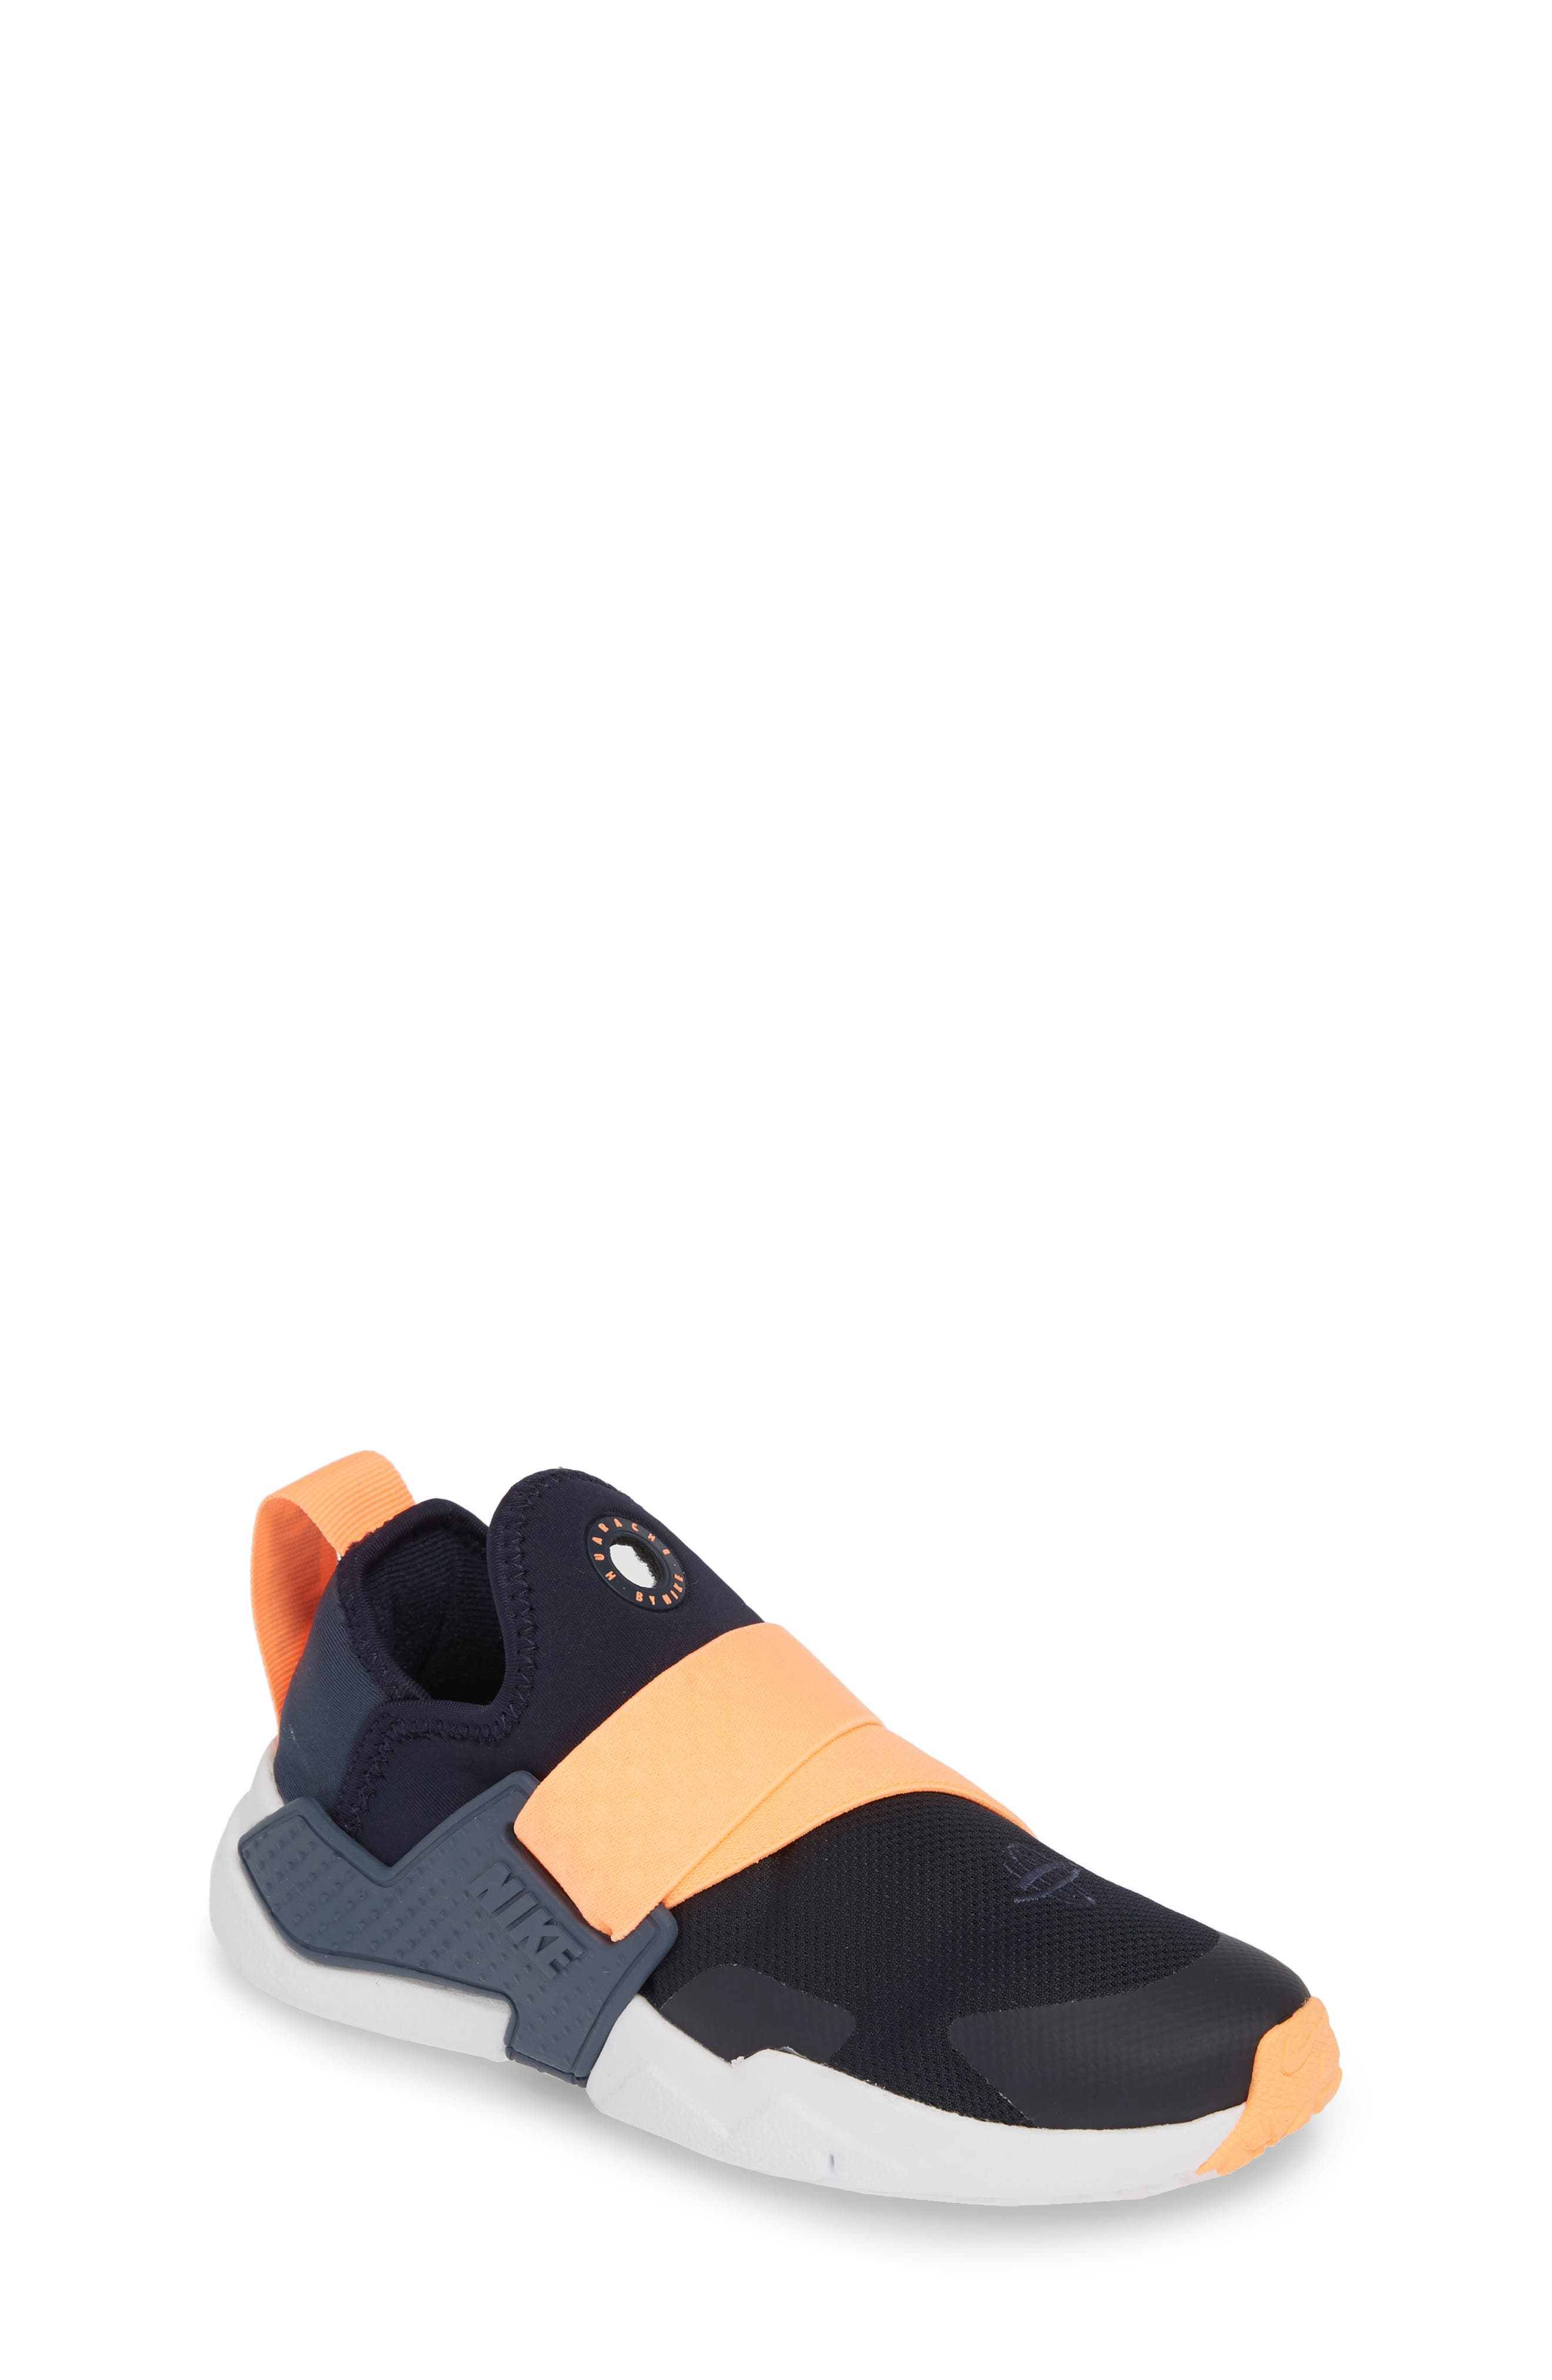 NIKE, Huarache Extreme Sneaker, Main thumbnail 1, color, OBSIDIAN/ POLARIZED BLUE-BLUE